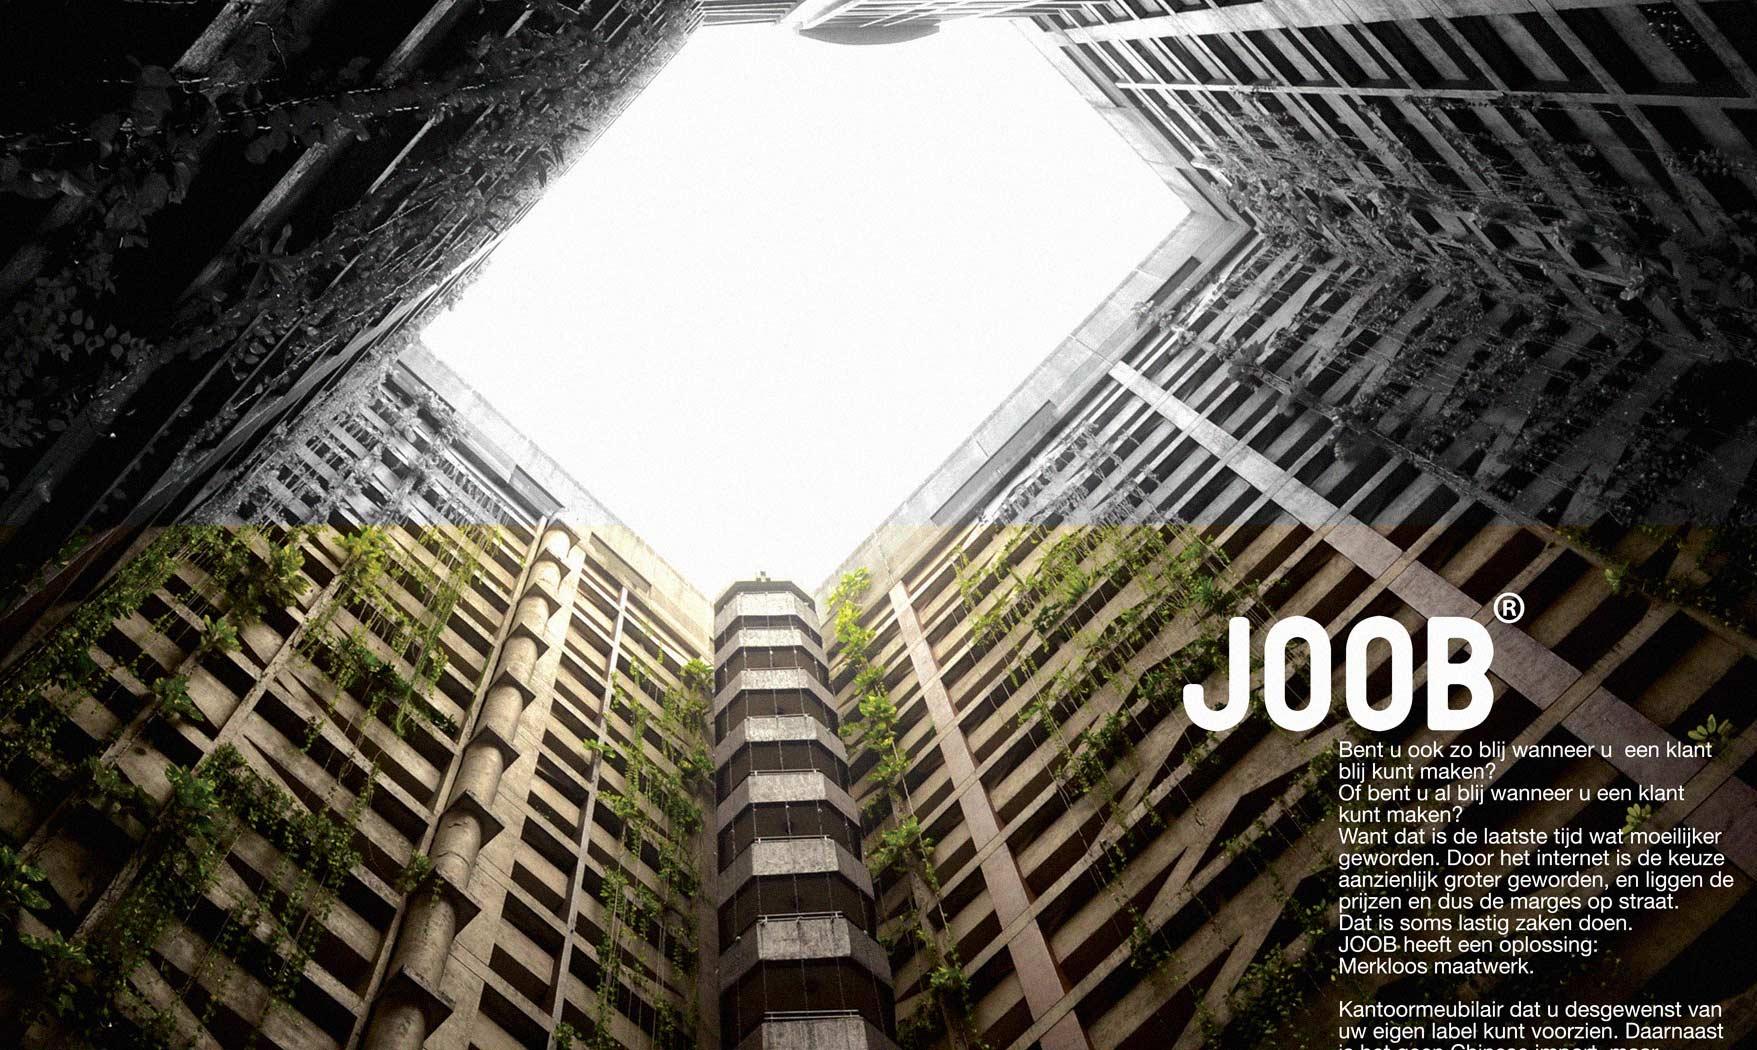 joob1-35